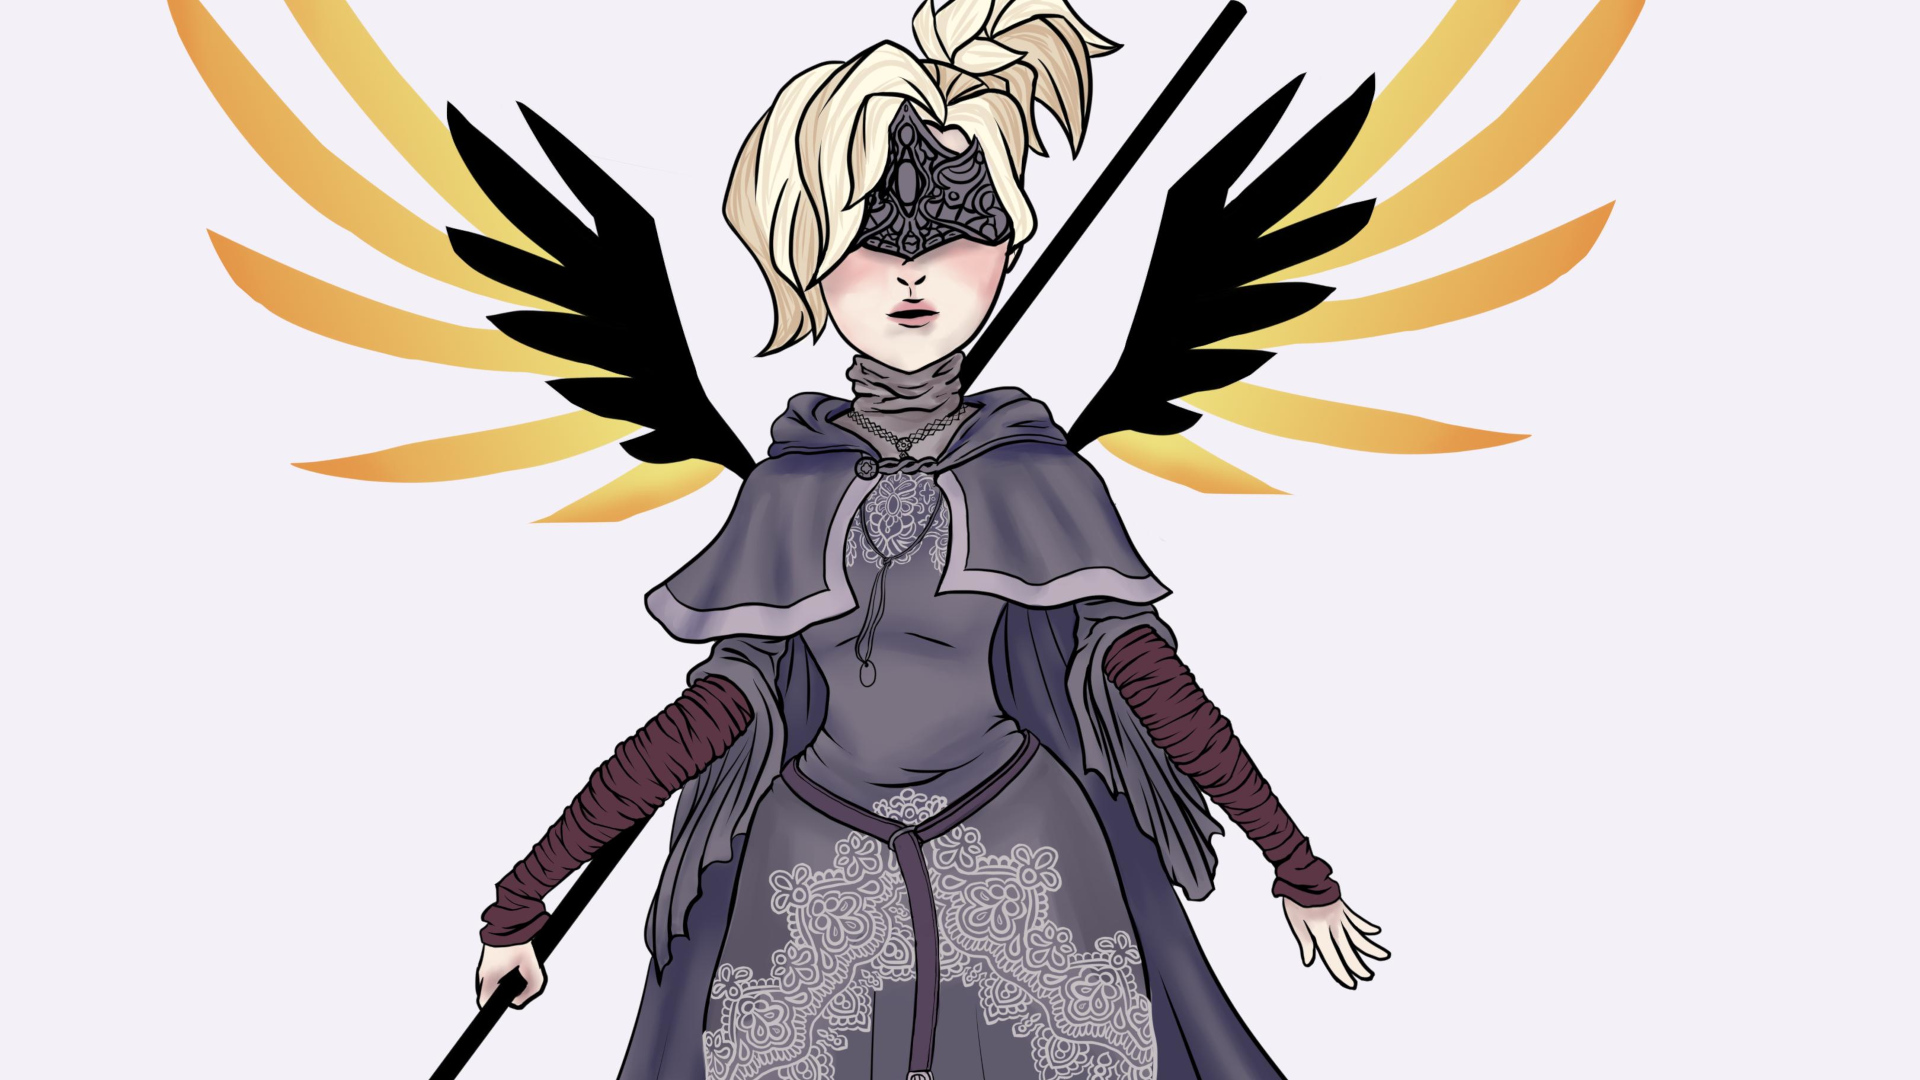 Mercy Fire Keeper - Dark Souls Crossover com Overwatch - FanArt Wallpaper